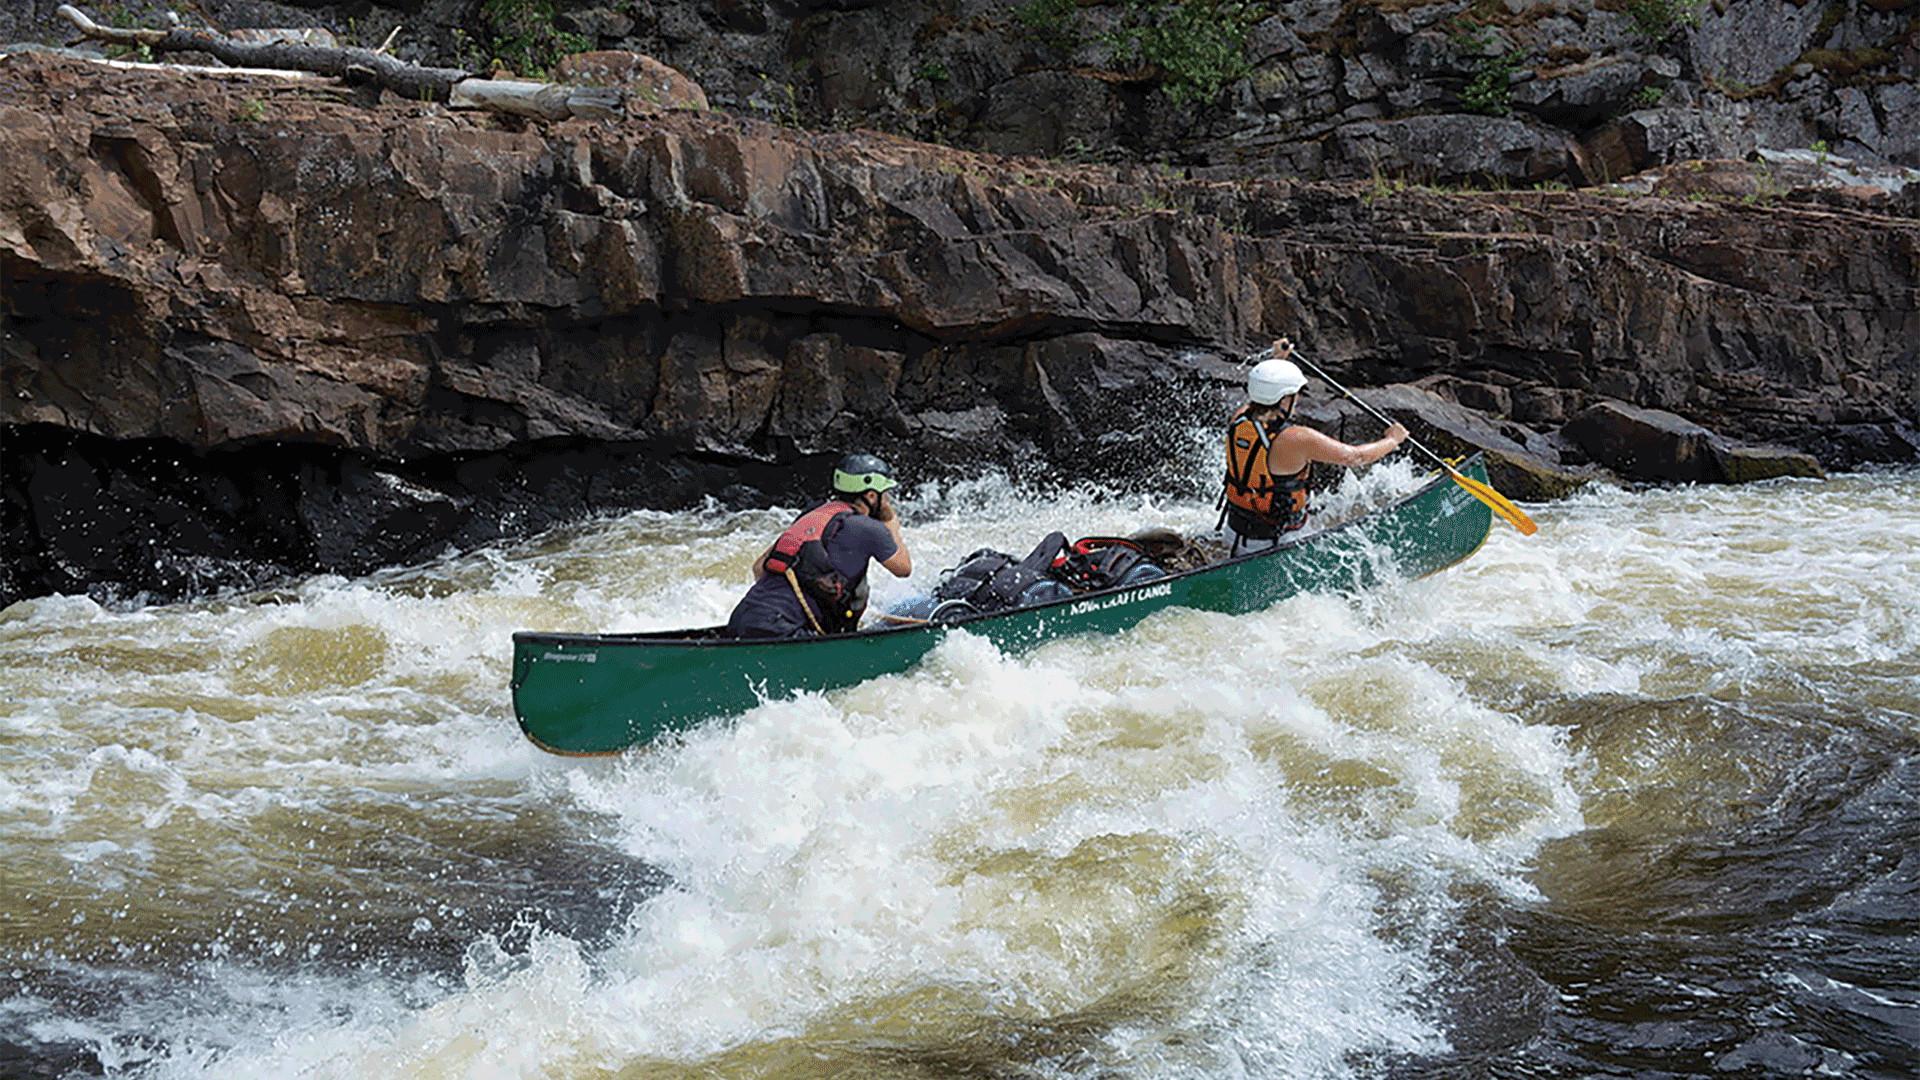 Running rapids on the Wanapitei River